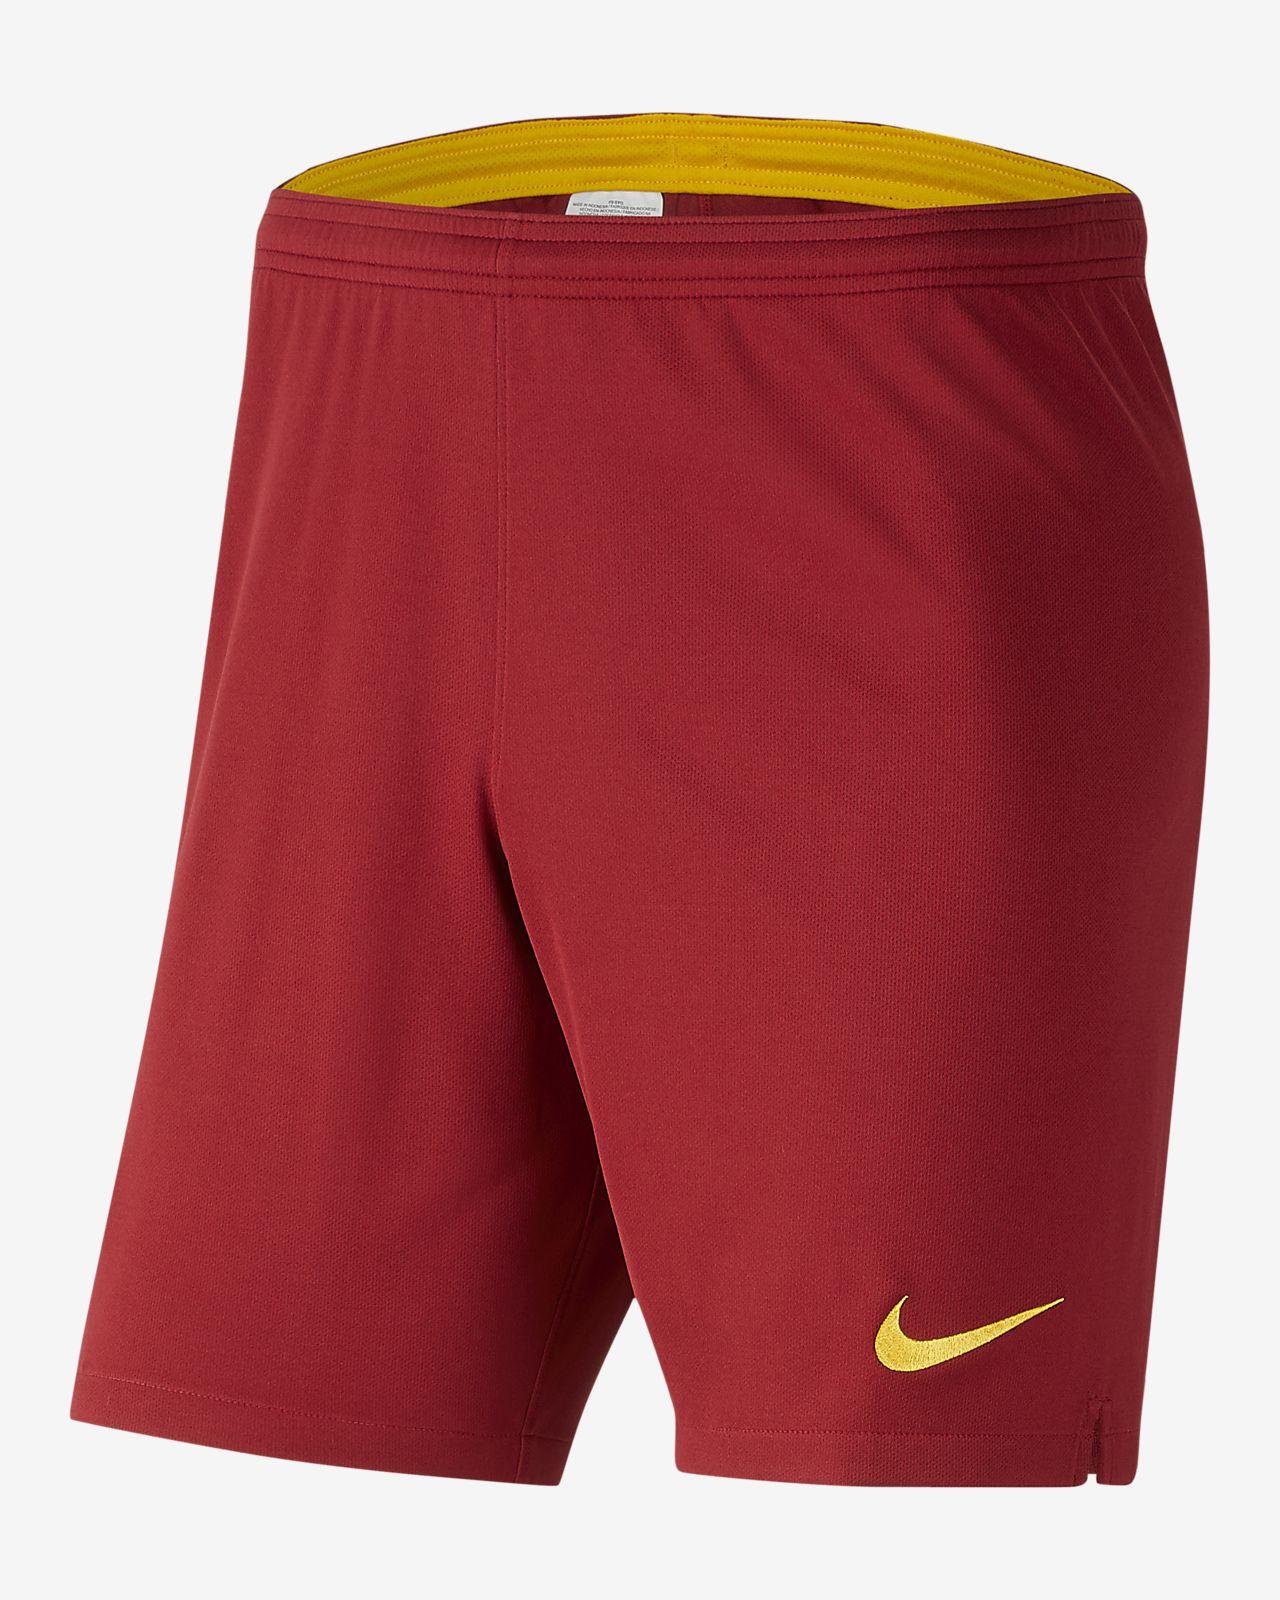 A.S. Roma 2019/20 Stadium Home/Away Men's Football Shorts